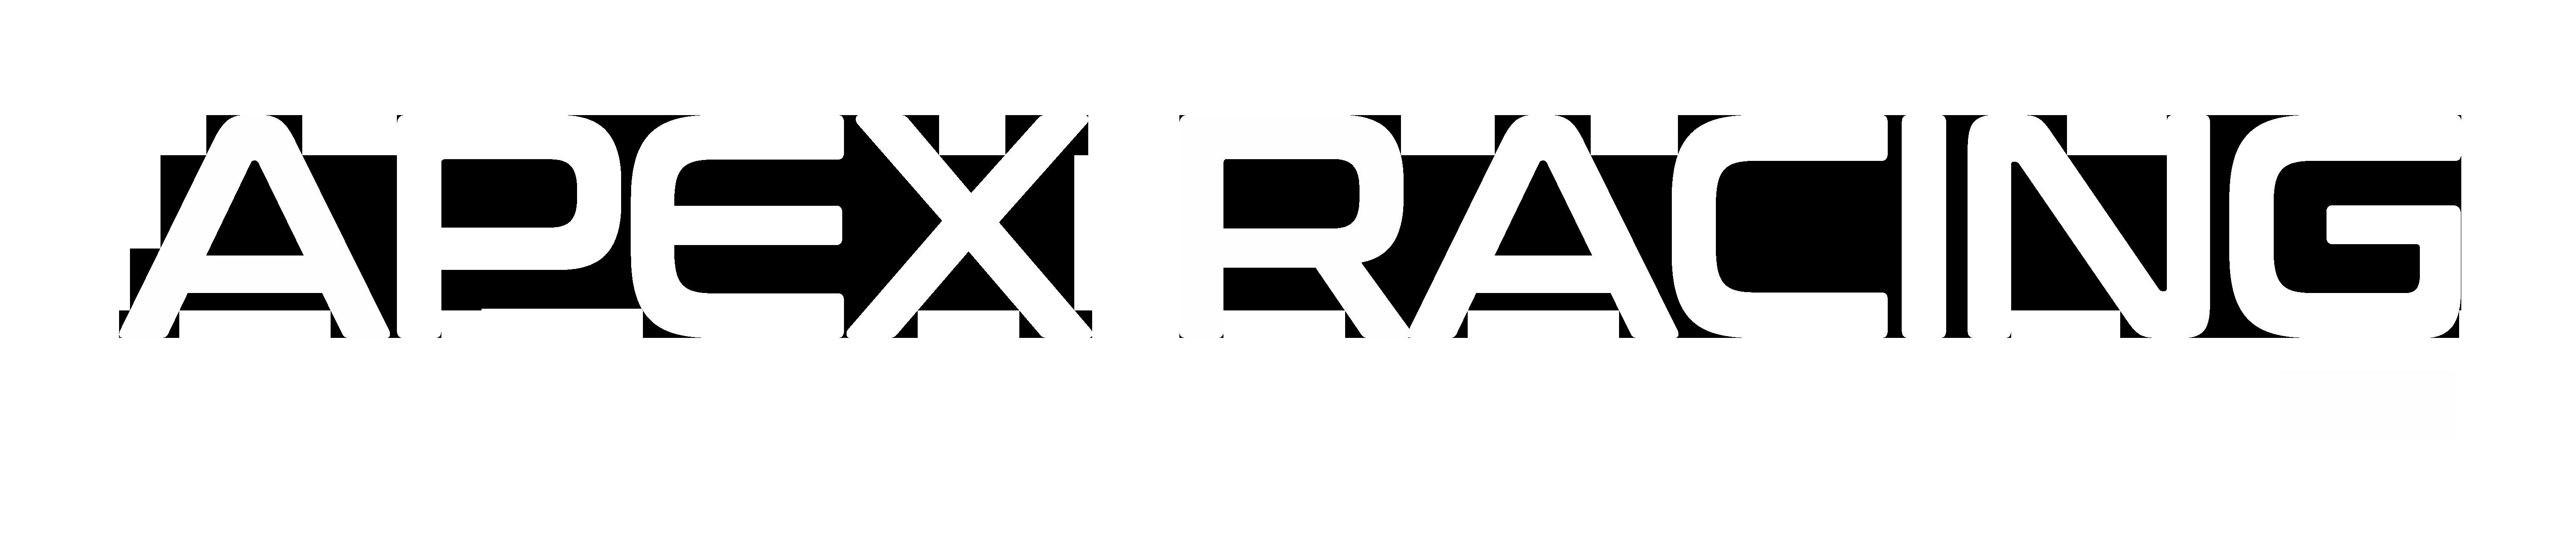 ARTV Division